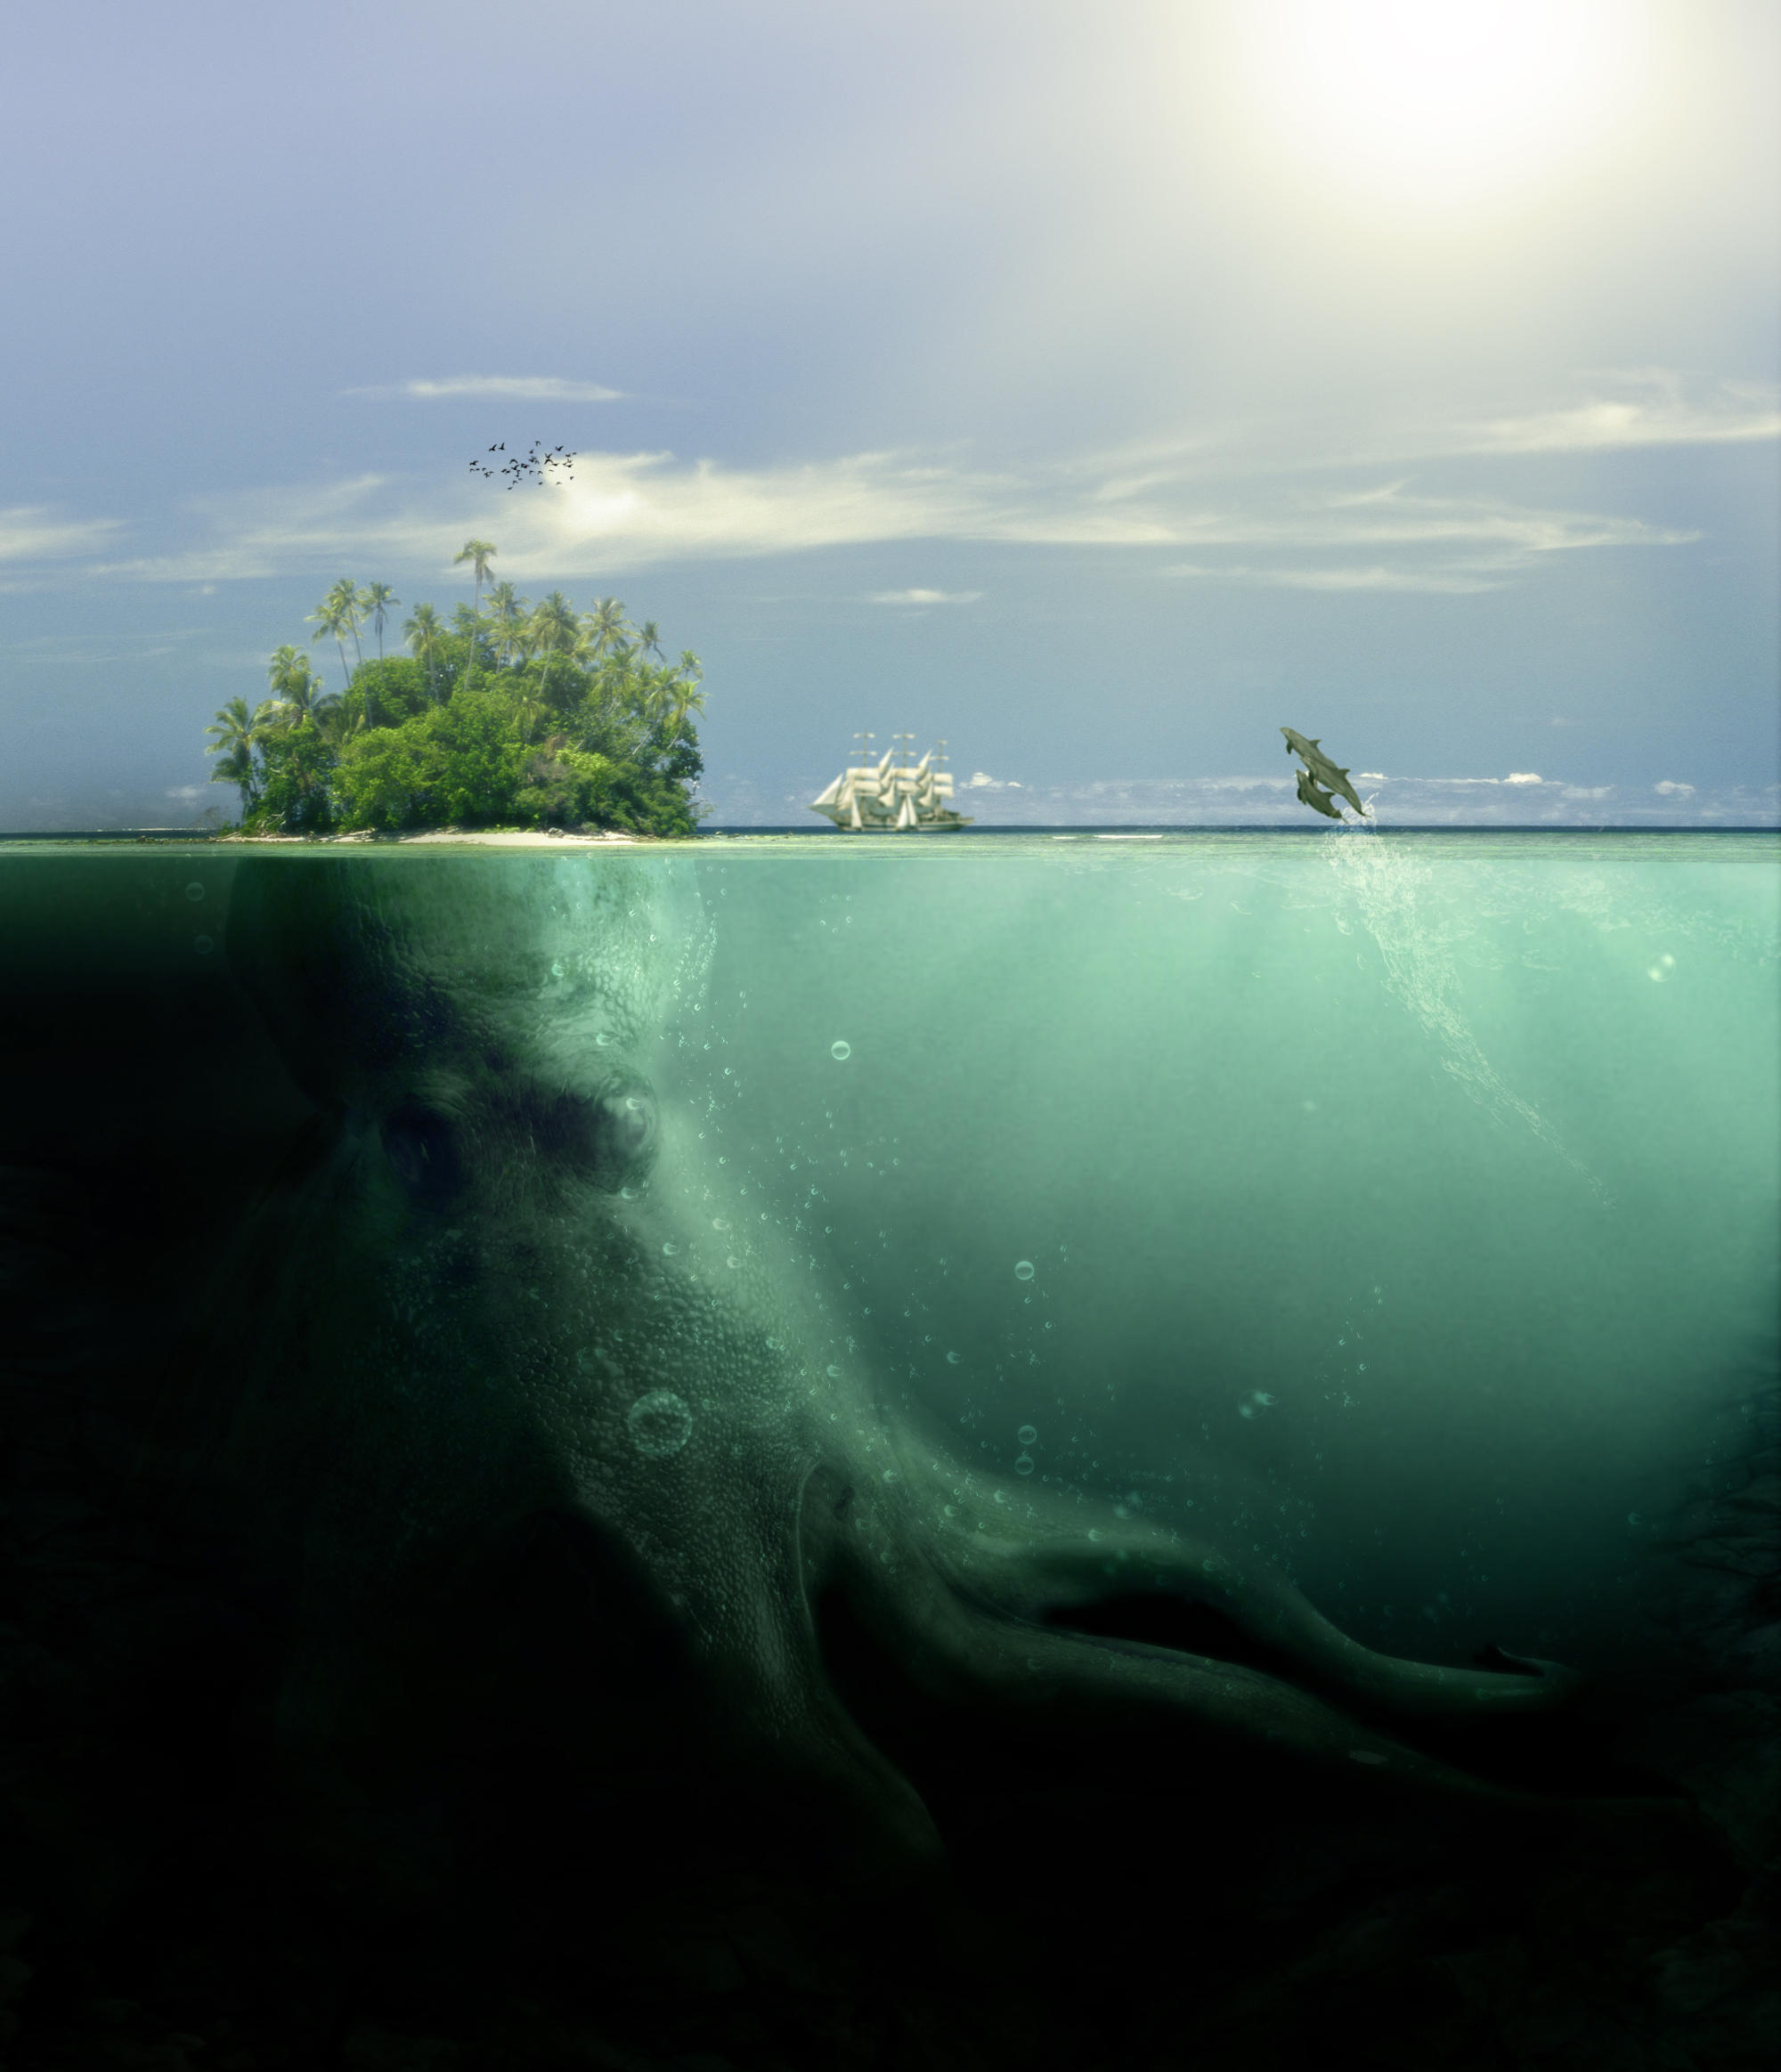 Octopus Isle by PSHoudini